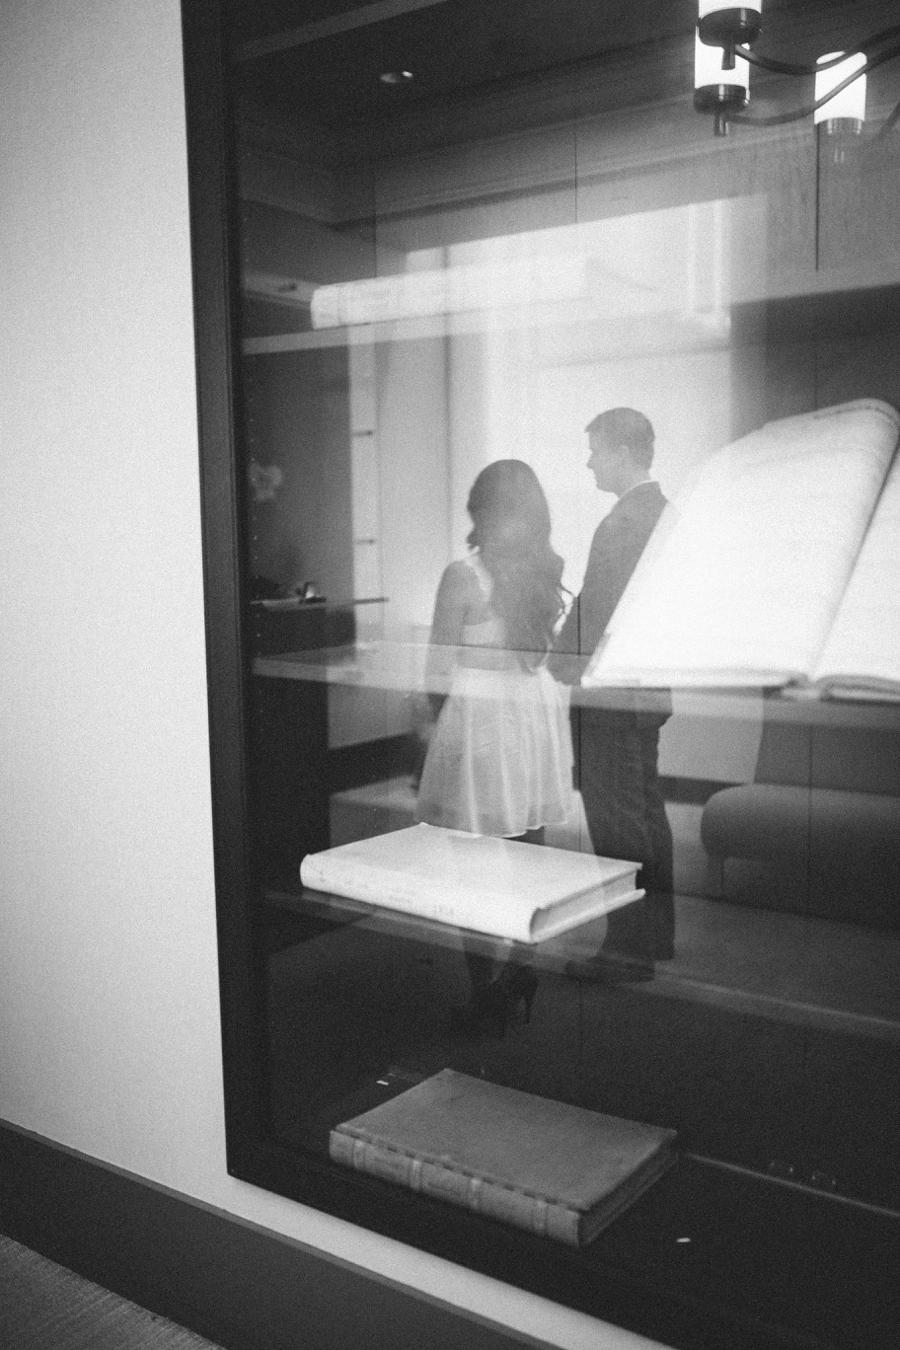 elopement-wedding-photographer-ny-nj-destination_0012.jpg